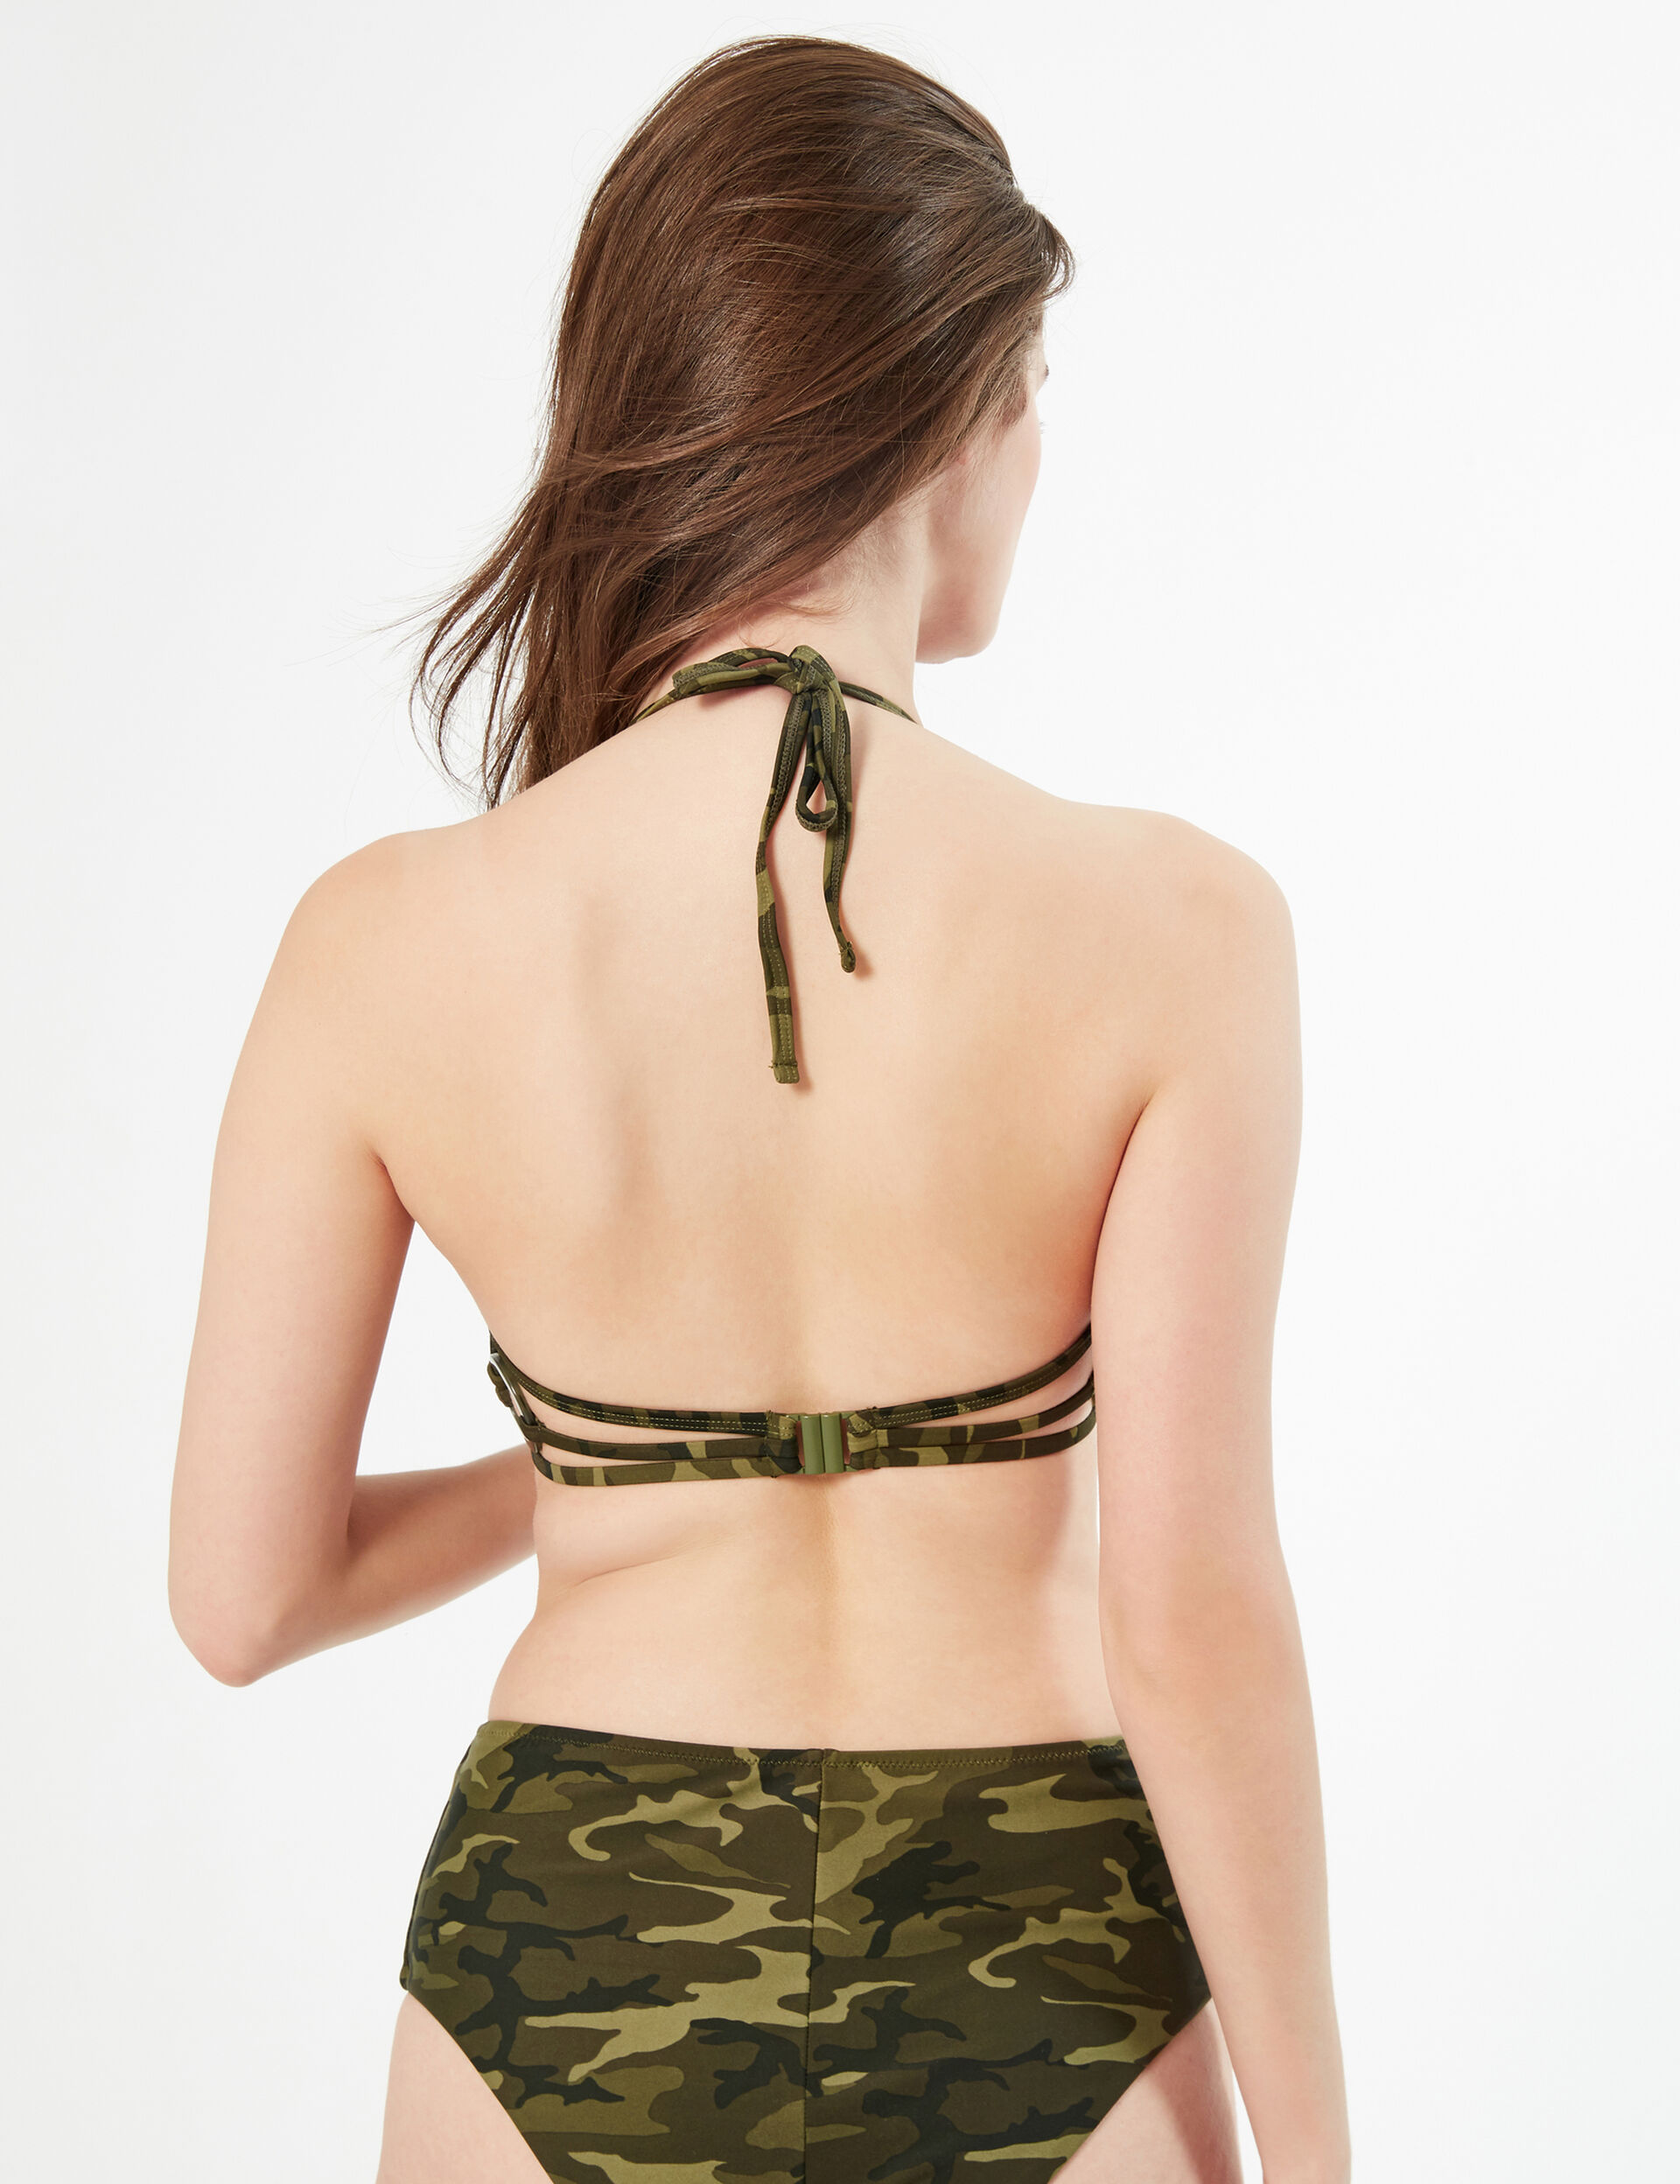 Camo push-up bikini top